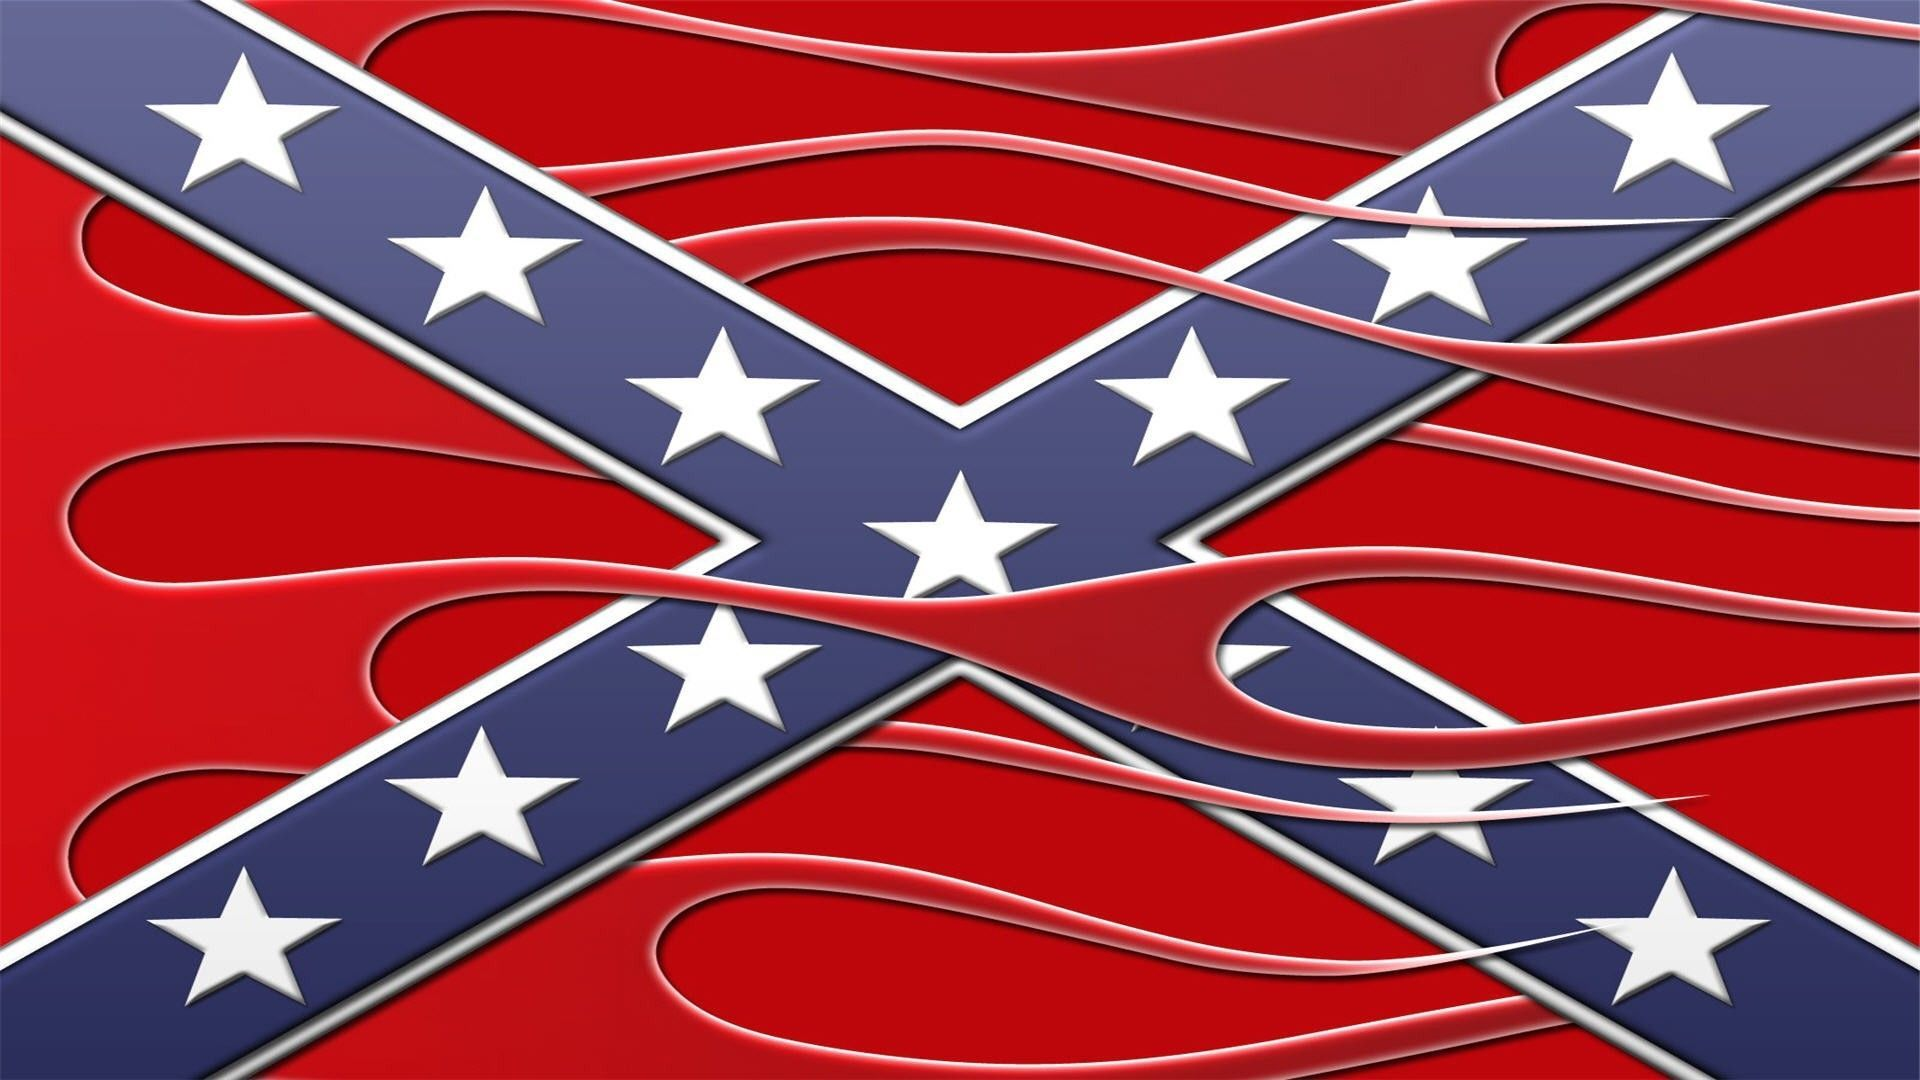 Free Confederate Flag Wallpaper